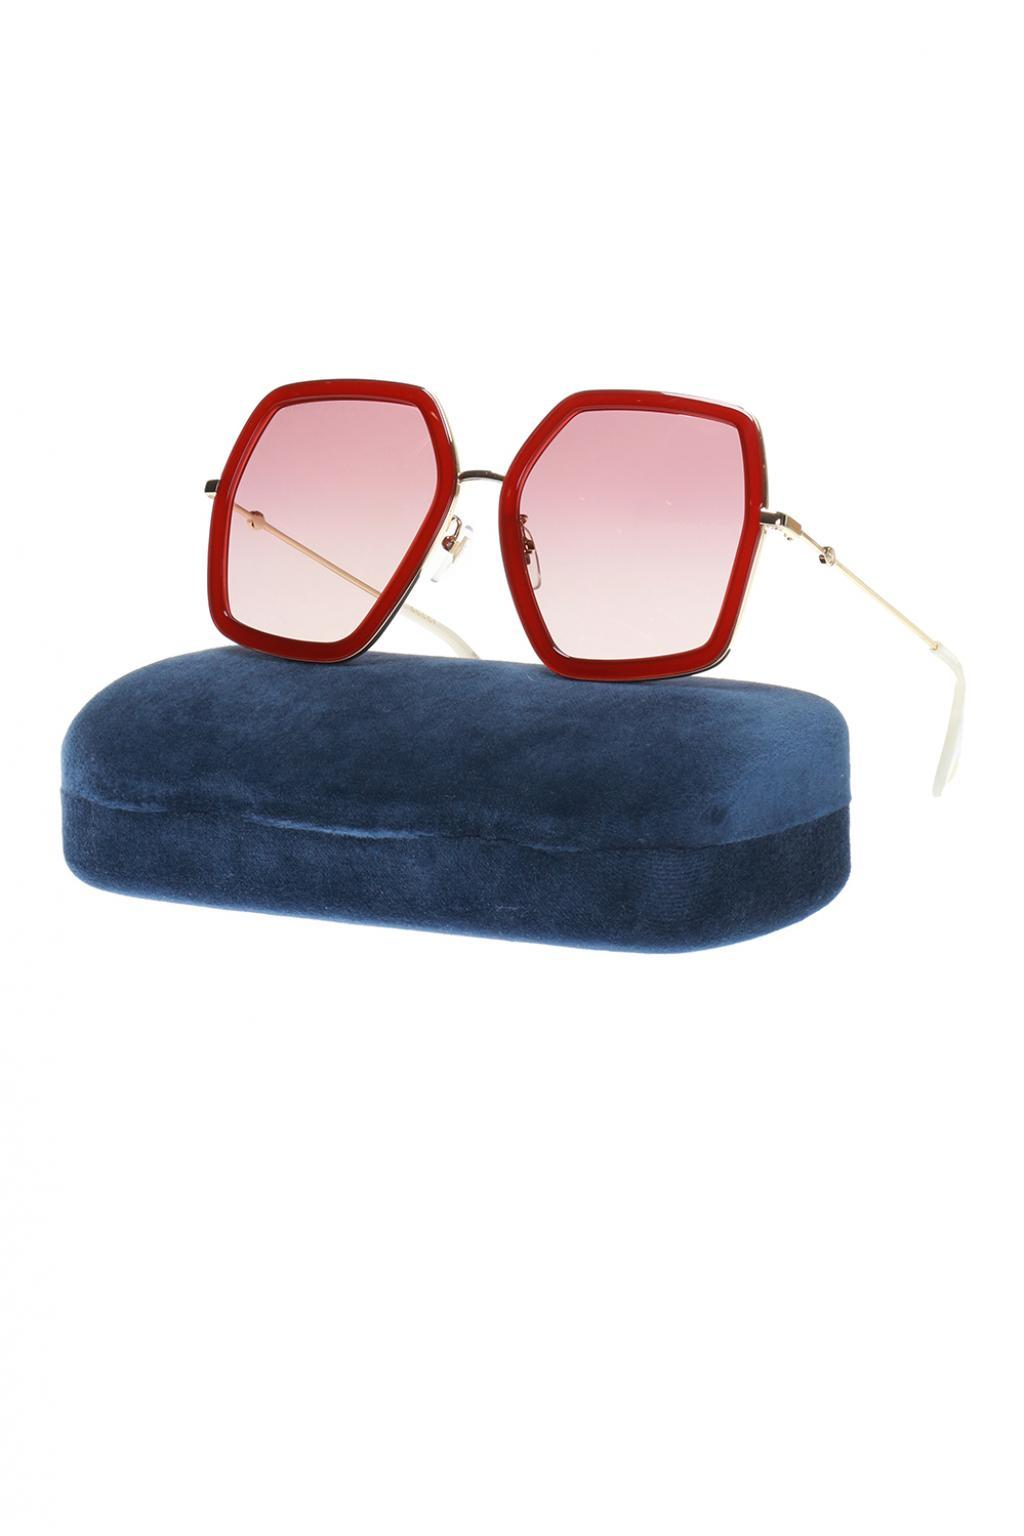 7c50dfd7542 Lyst - Gucci Bee Motif Sunglasses in Red